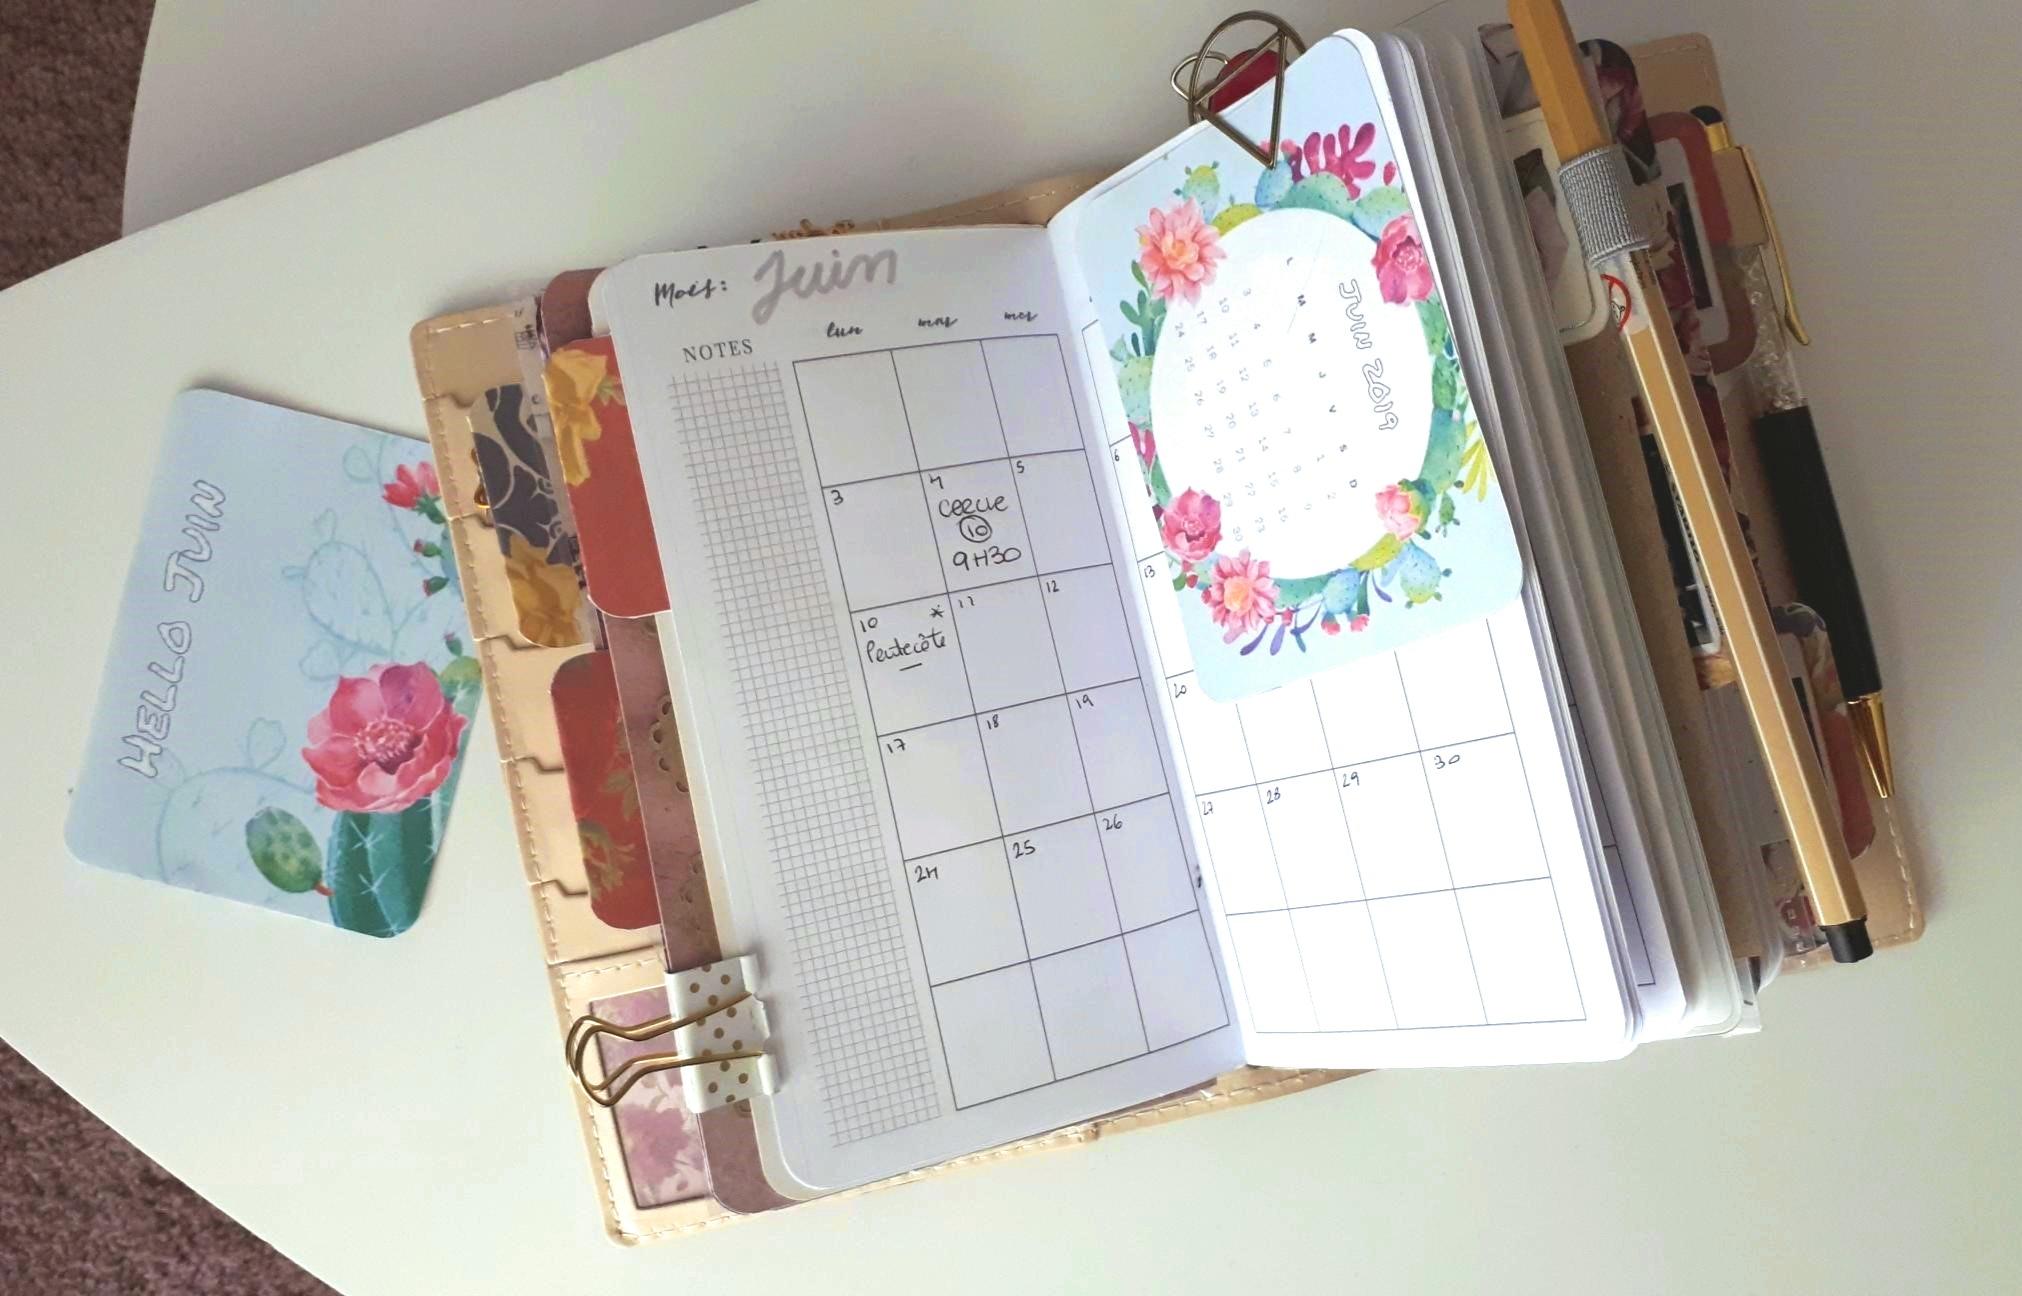 Calendrier et fond d'écran juin 2019 cartes journaling